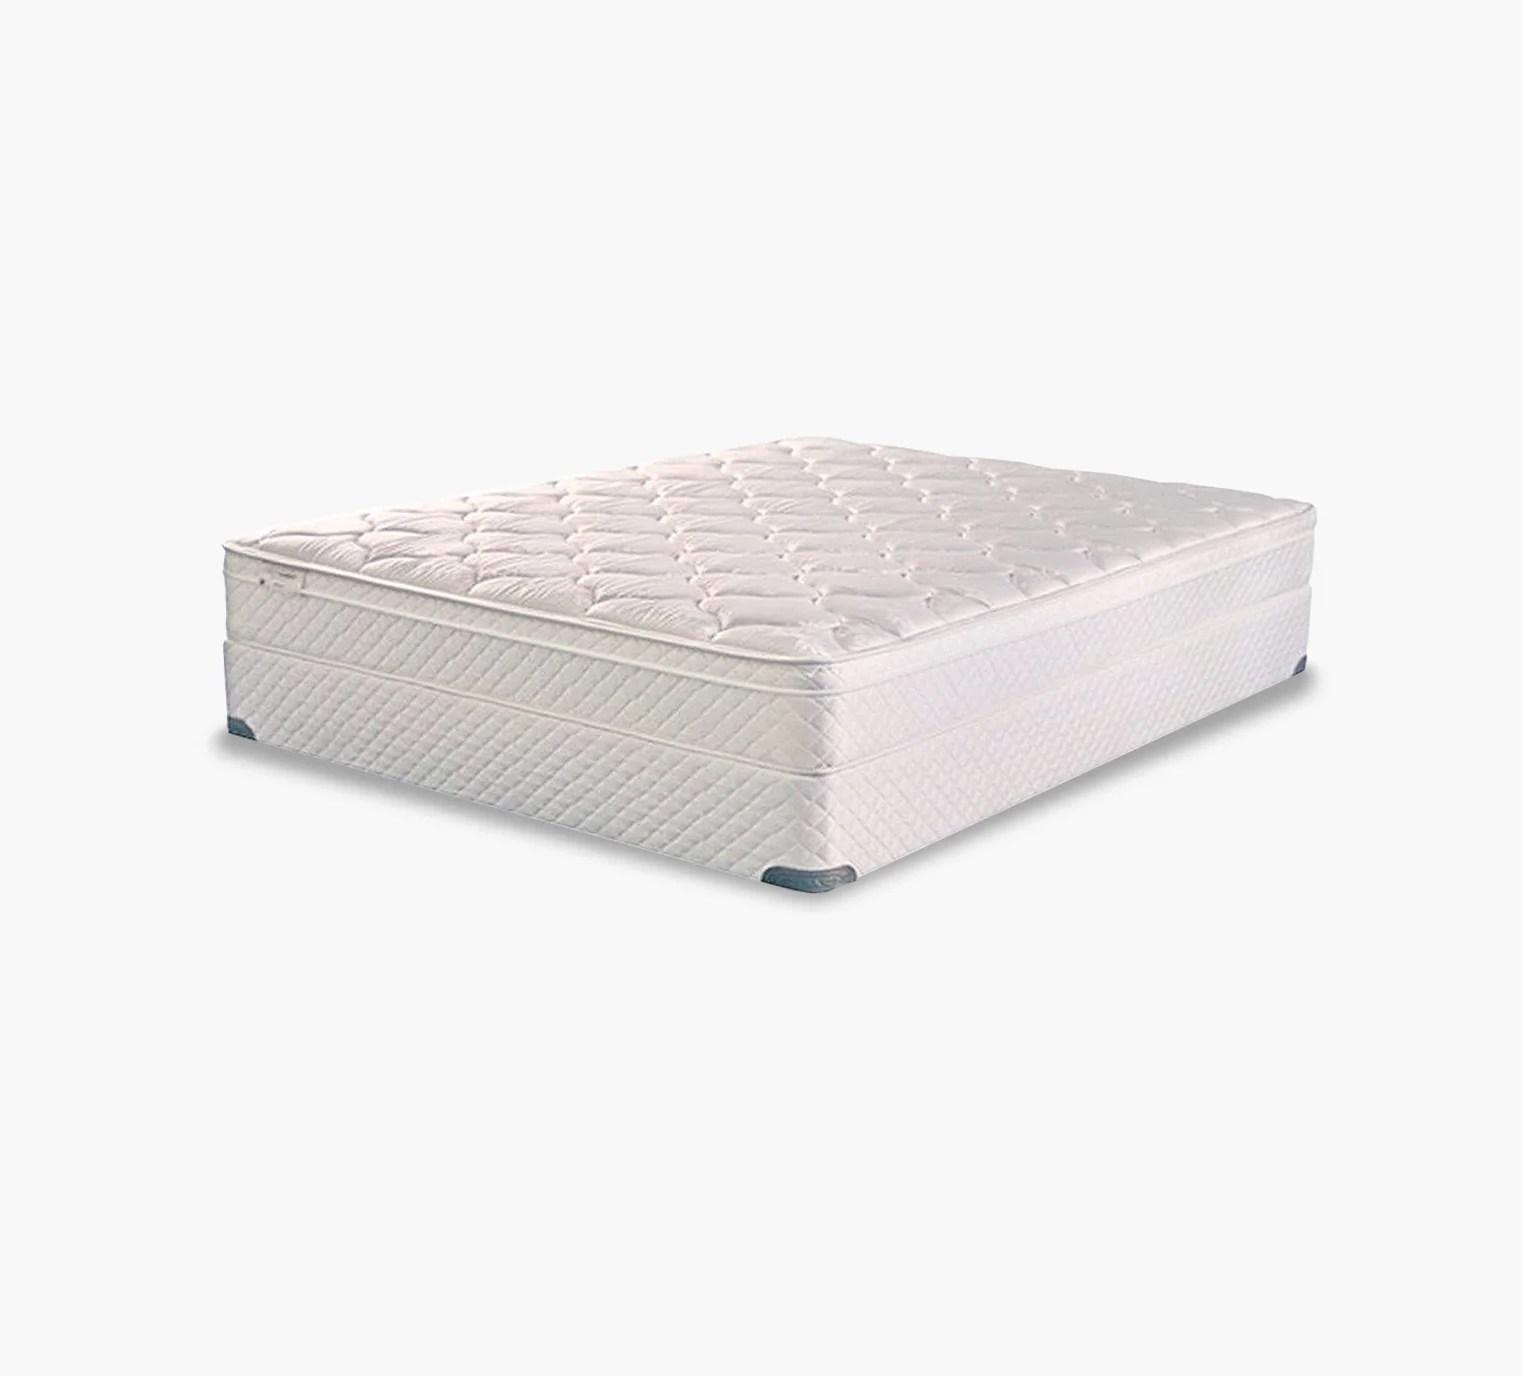 therapedic meadow plush pillow top queen mattress set